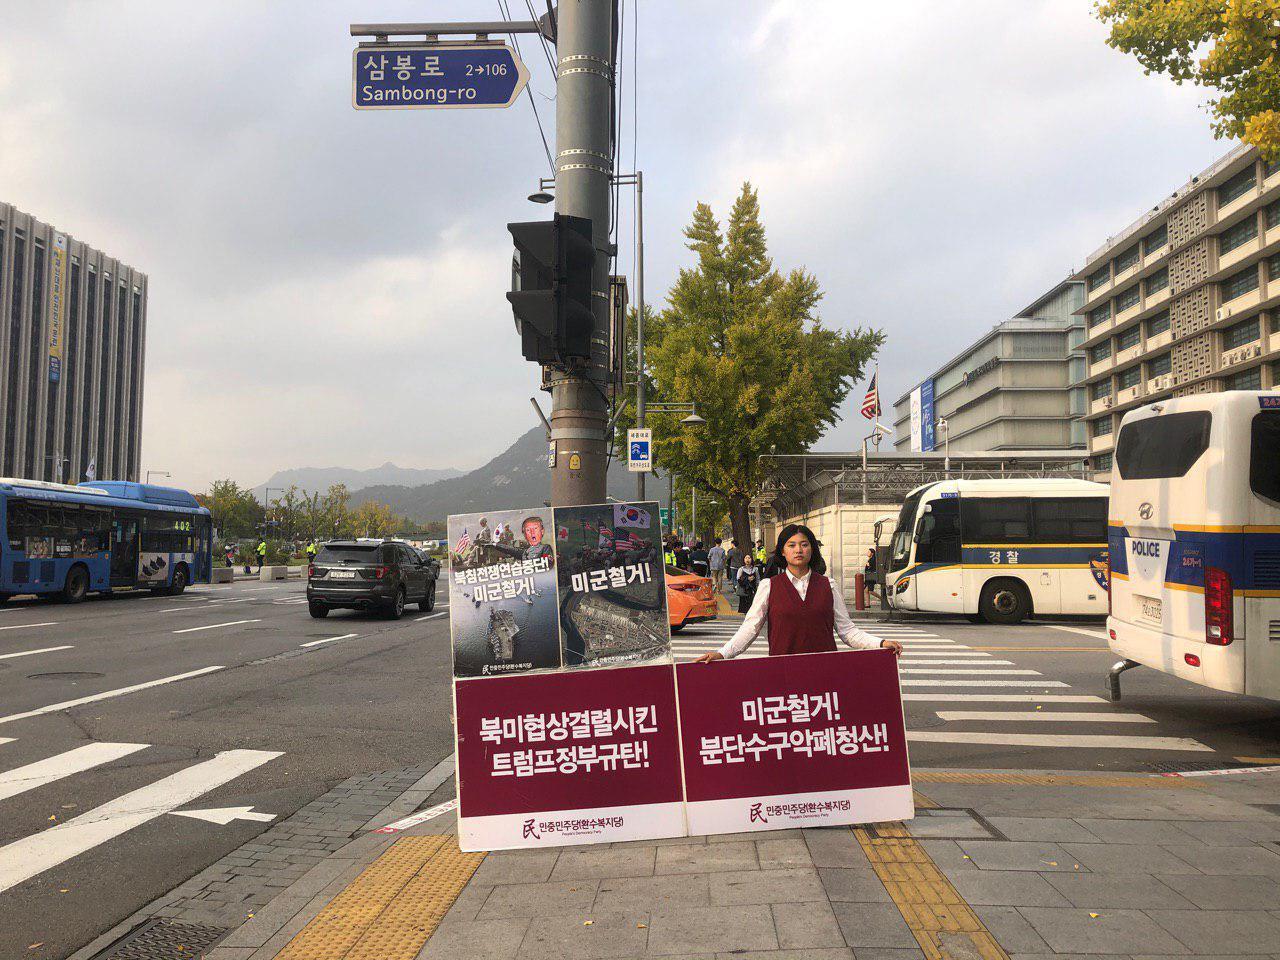 photo_2019-10-31_08-14-46.jpg